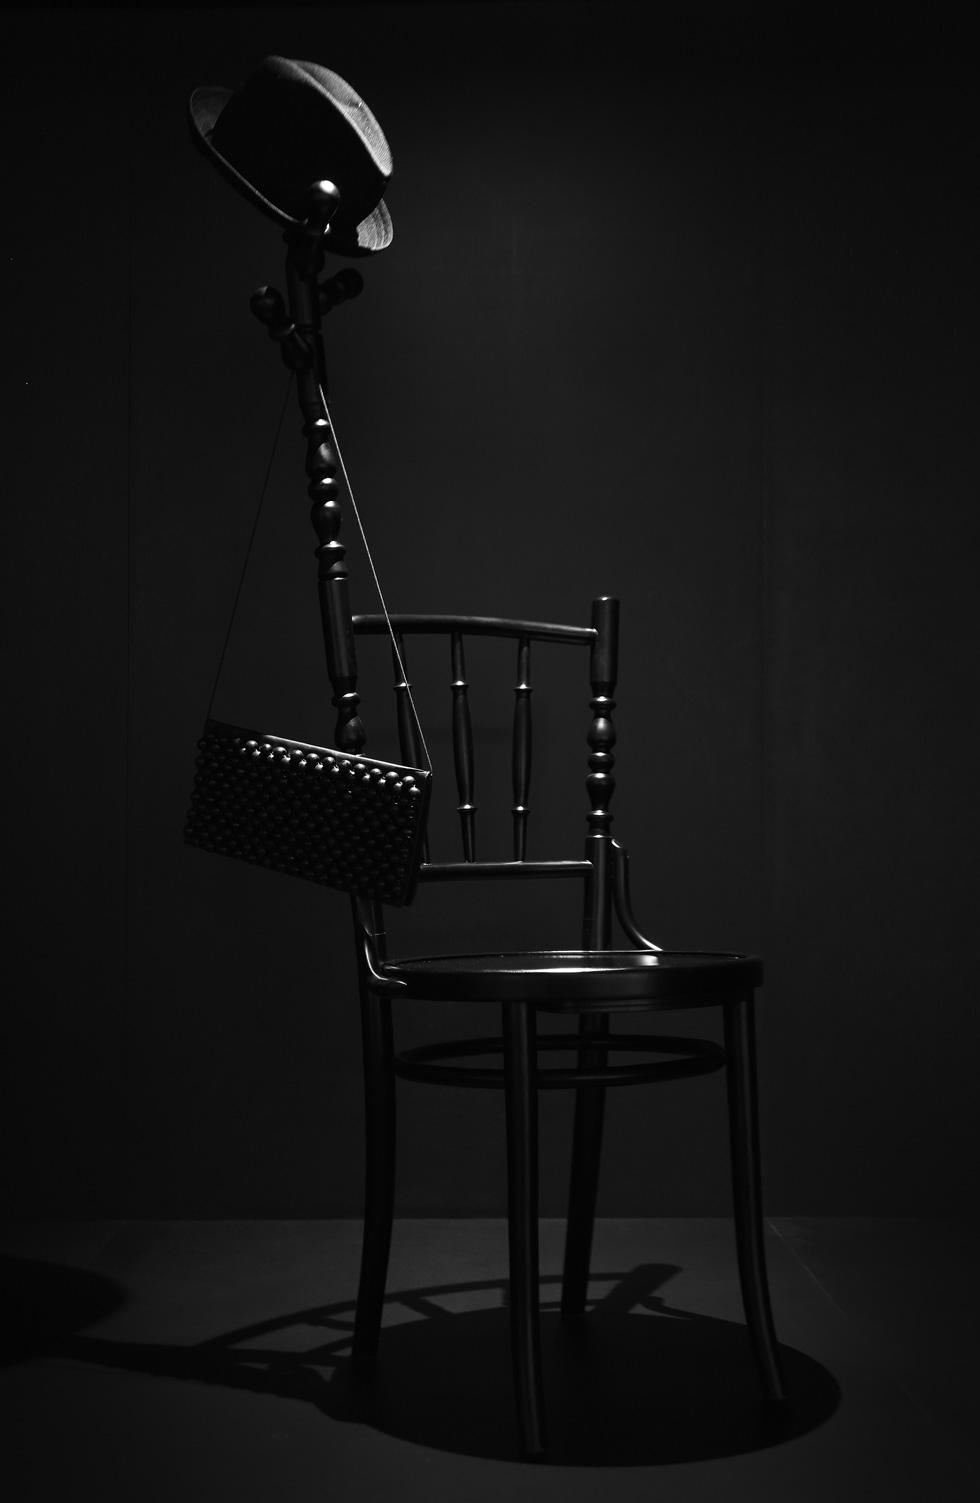 Extension-Chair-studio-aandacht